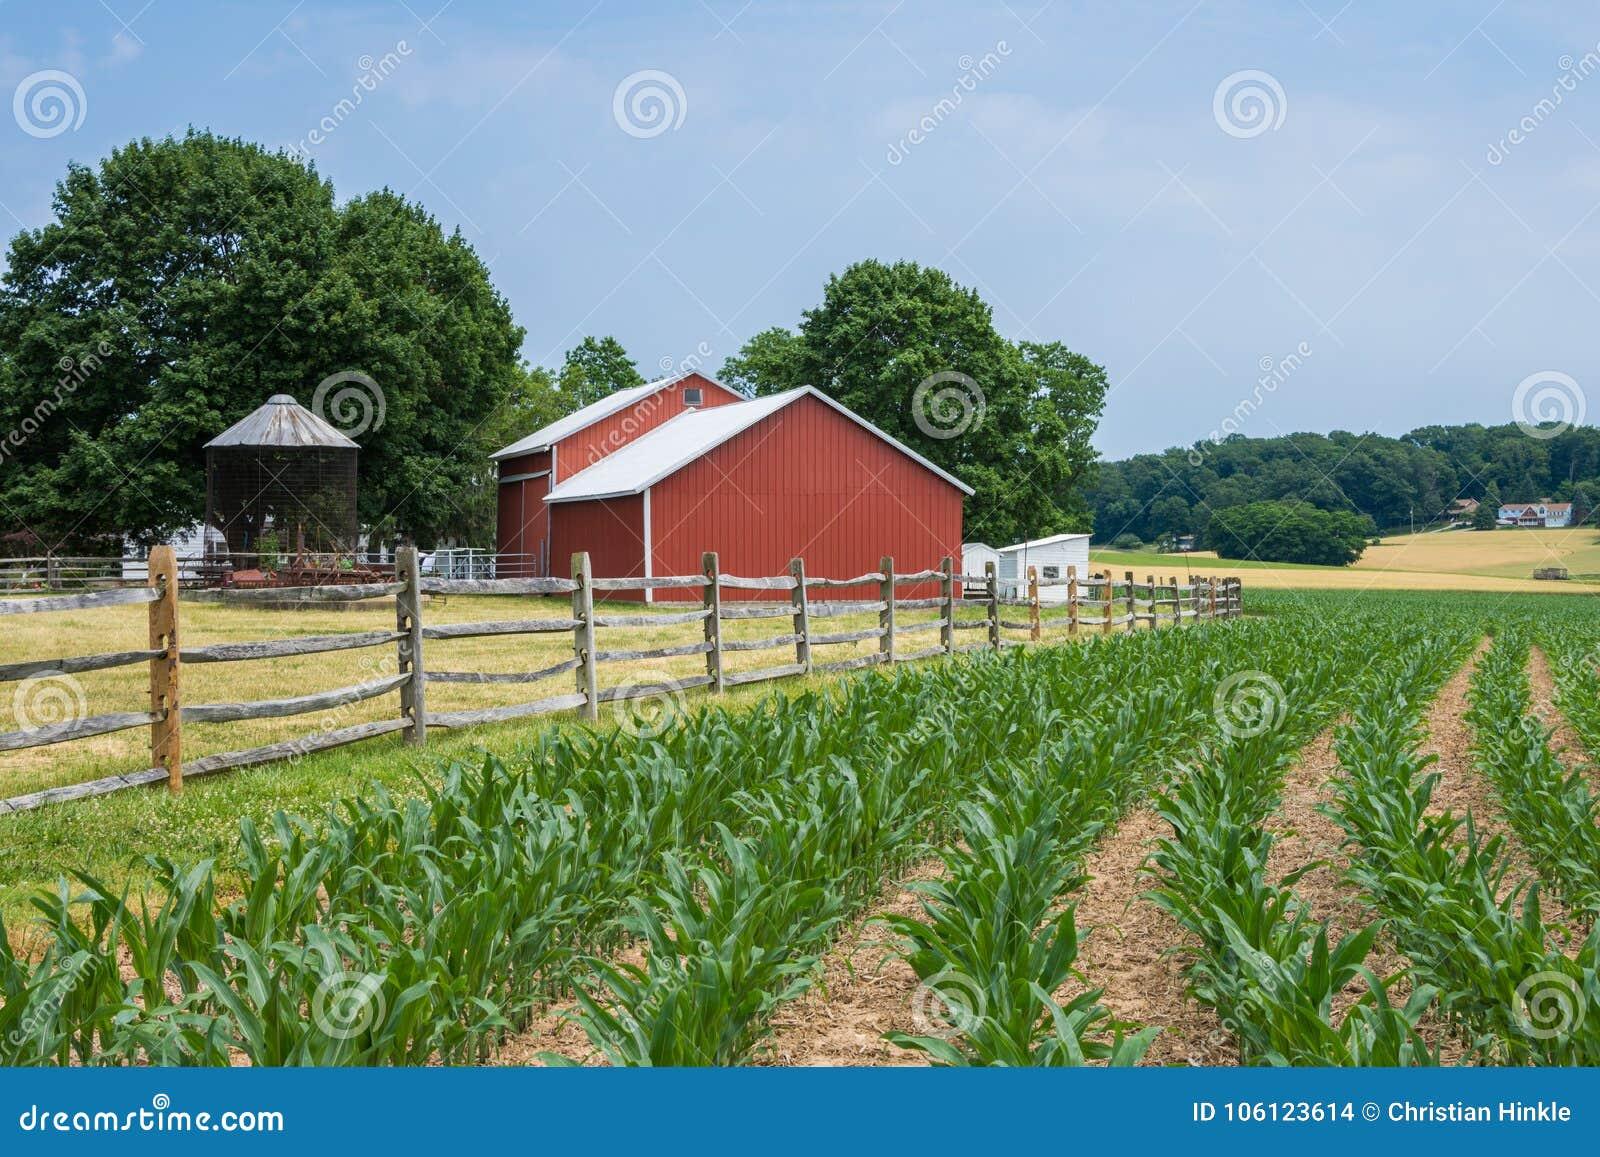 Rural Country York County Pennsylvania Farmland, on a Summer Day